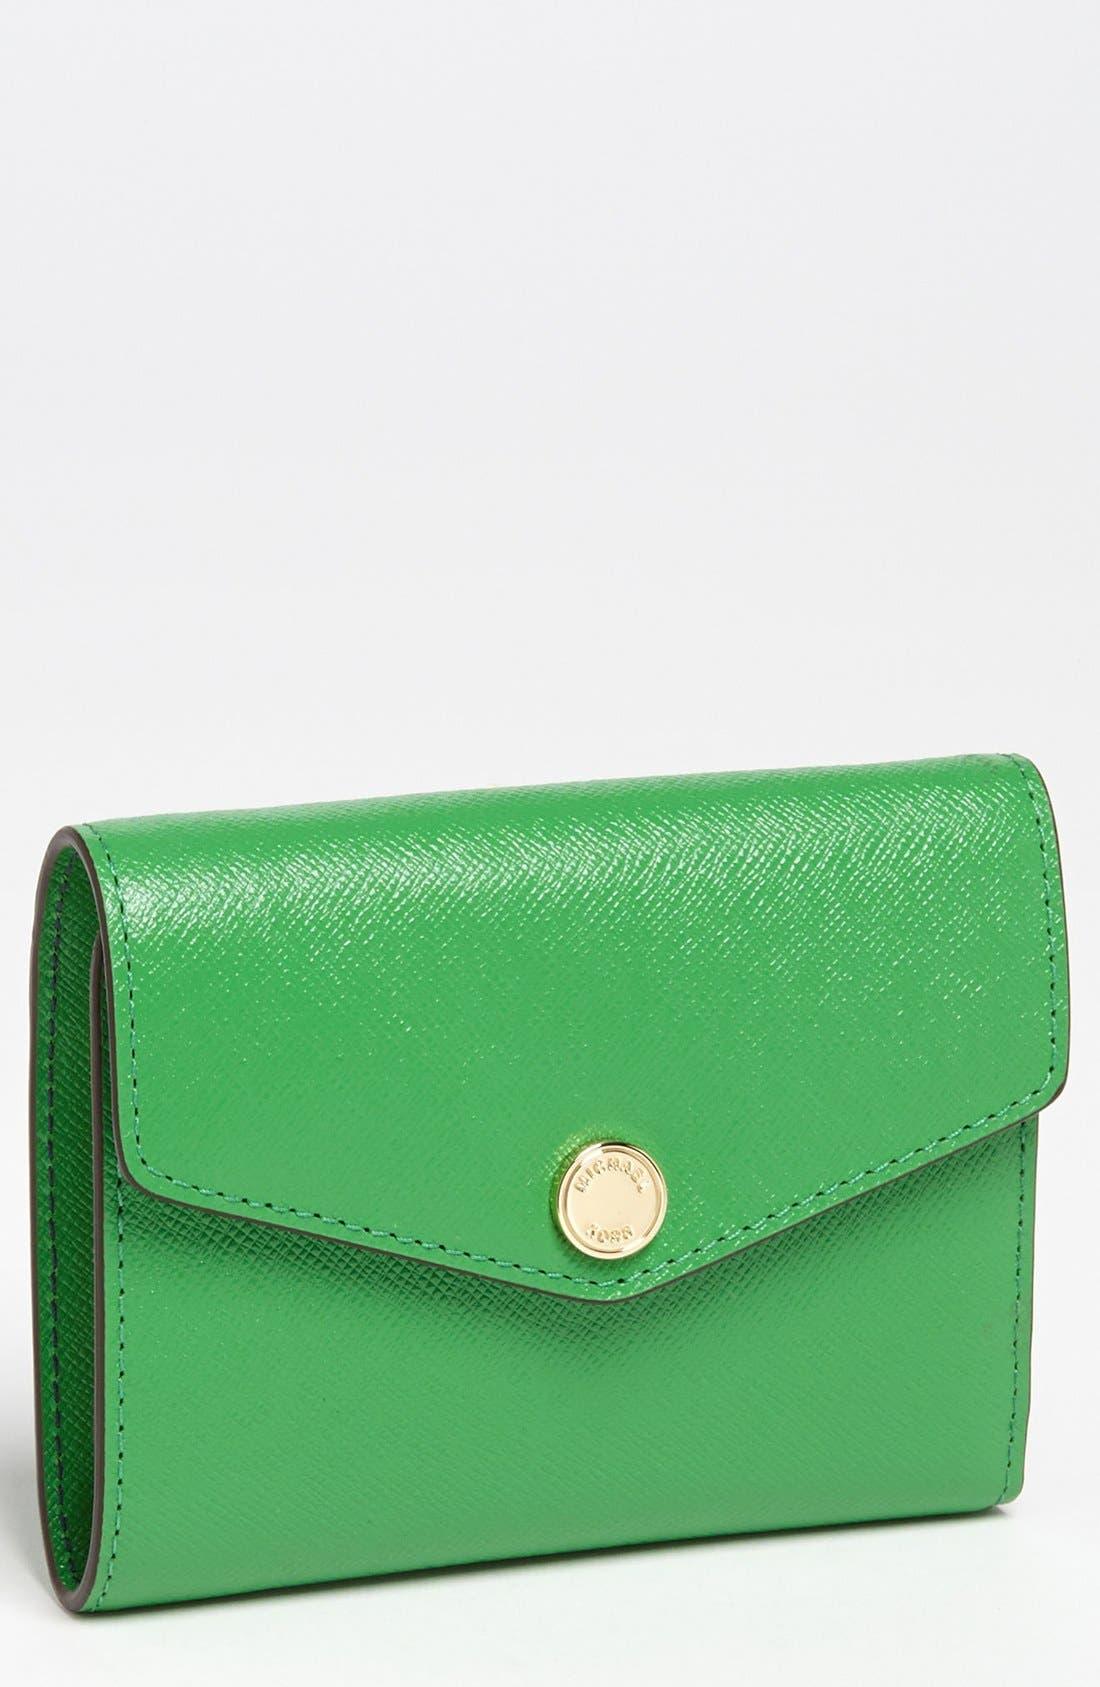 Main Image - MICHAEL Michael Kors 'Medium' Carryall Wallet